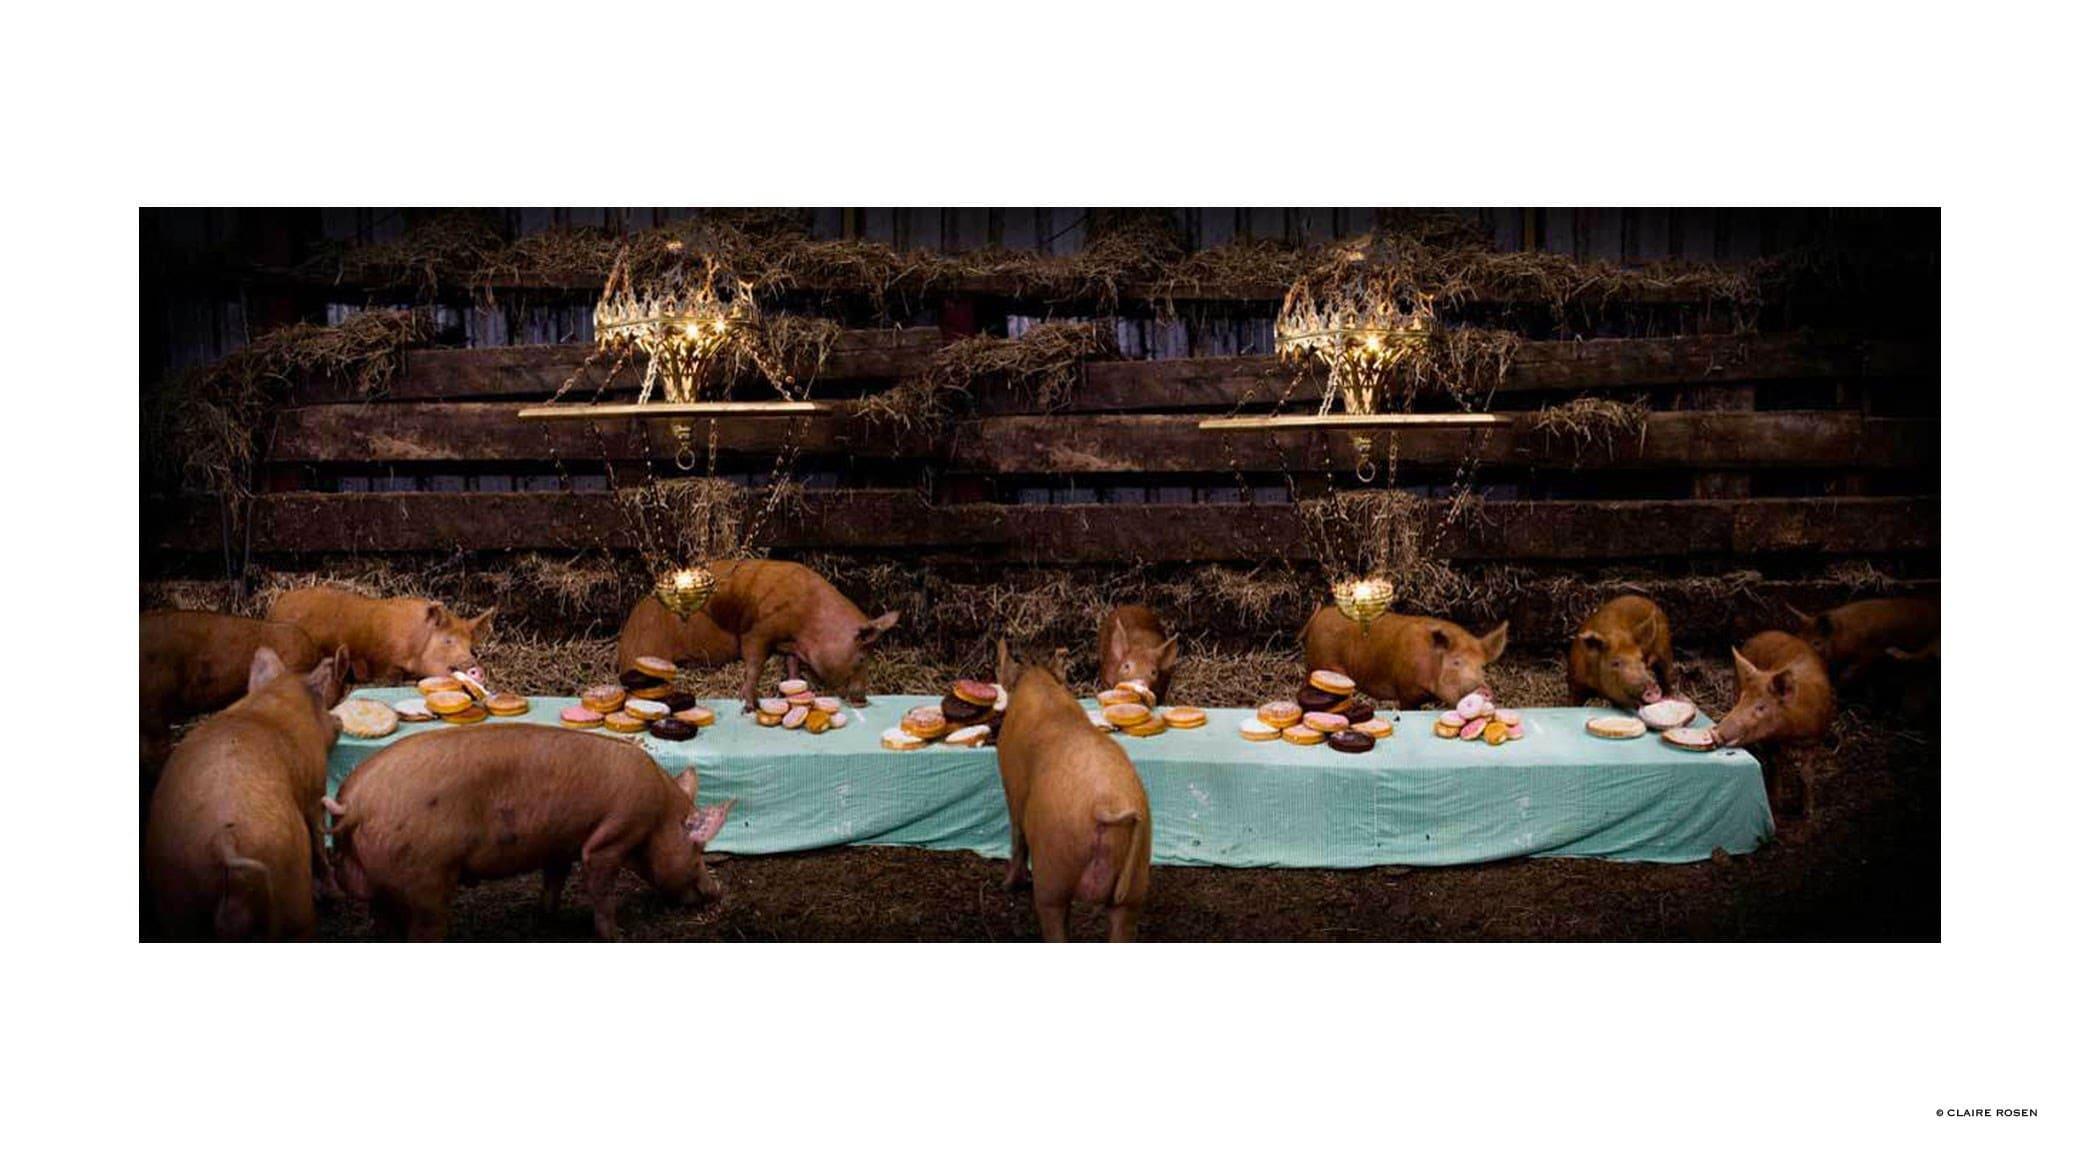 original_pigs-claire-rosen-finedininglovers.jpg